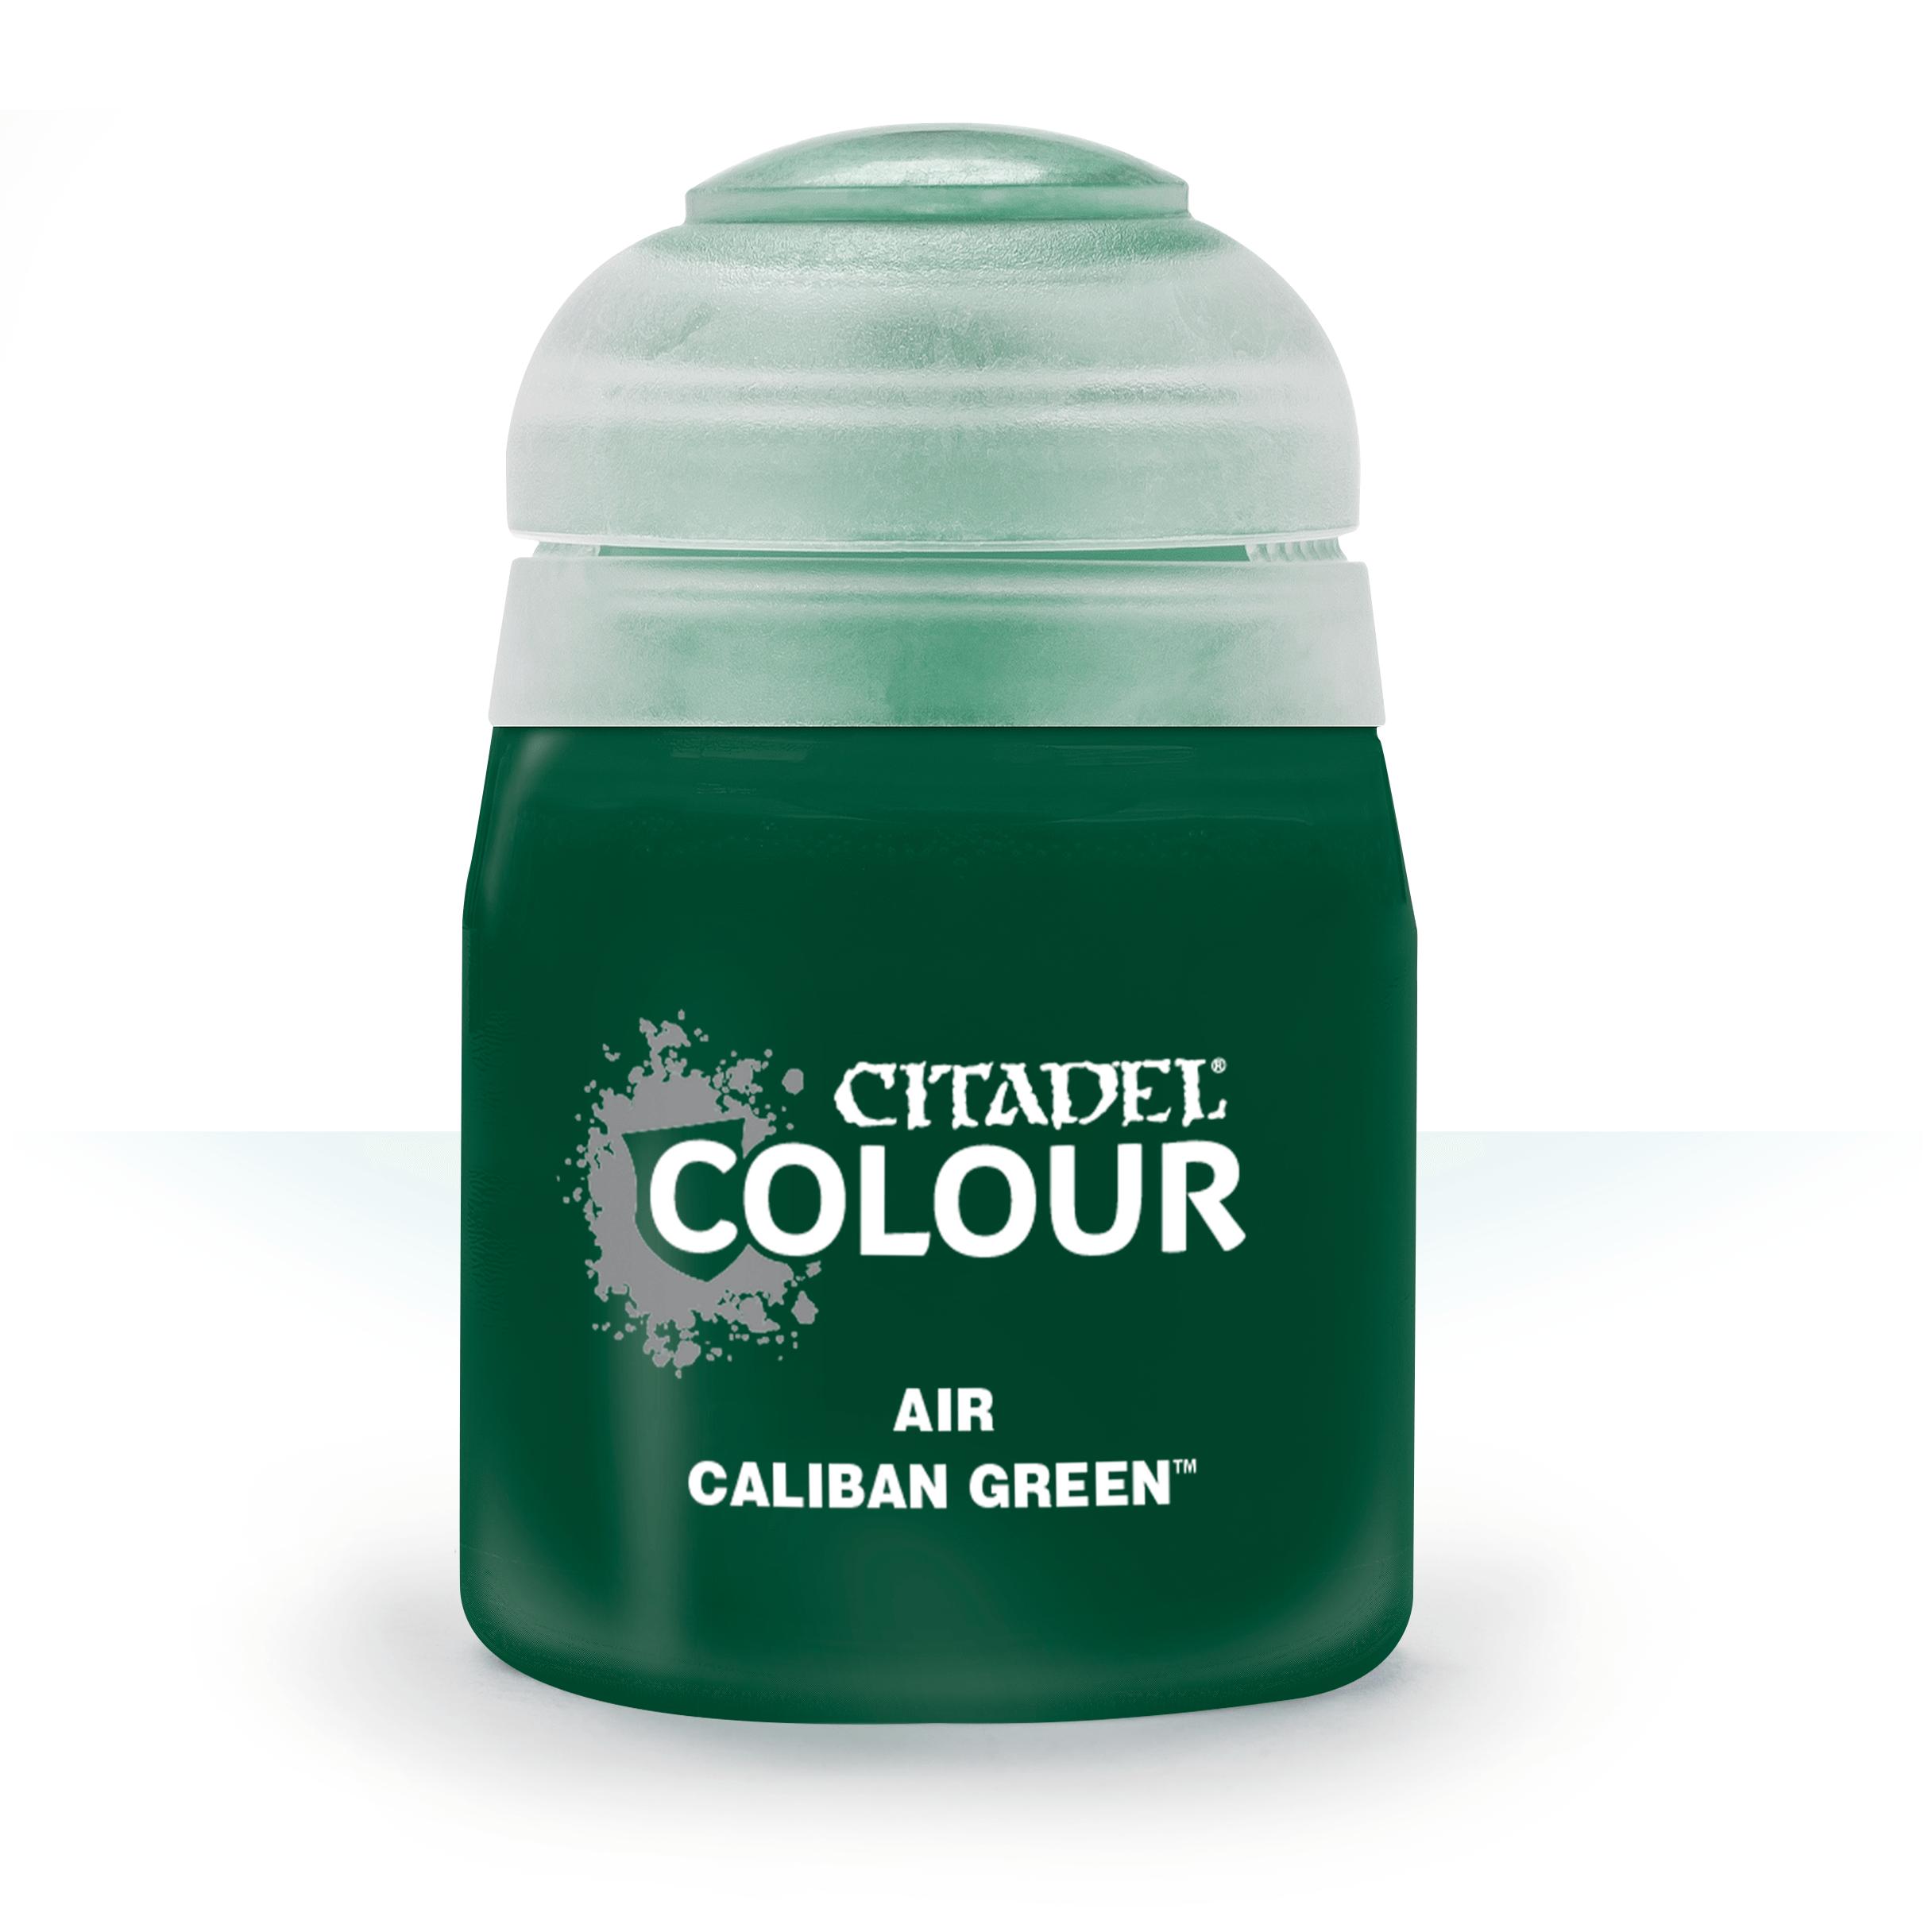 Caliban Green, Citadel Air 24ml